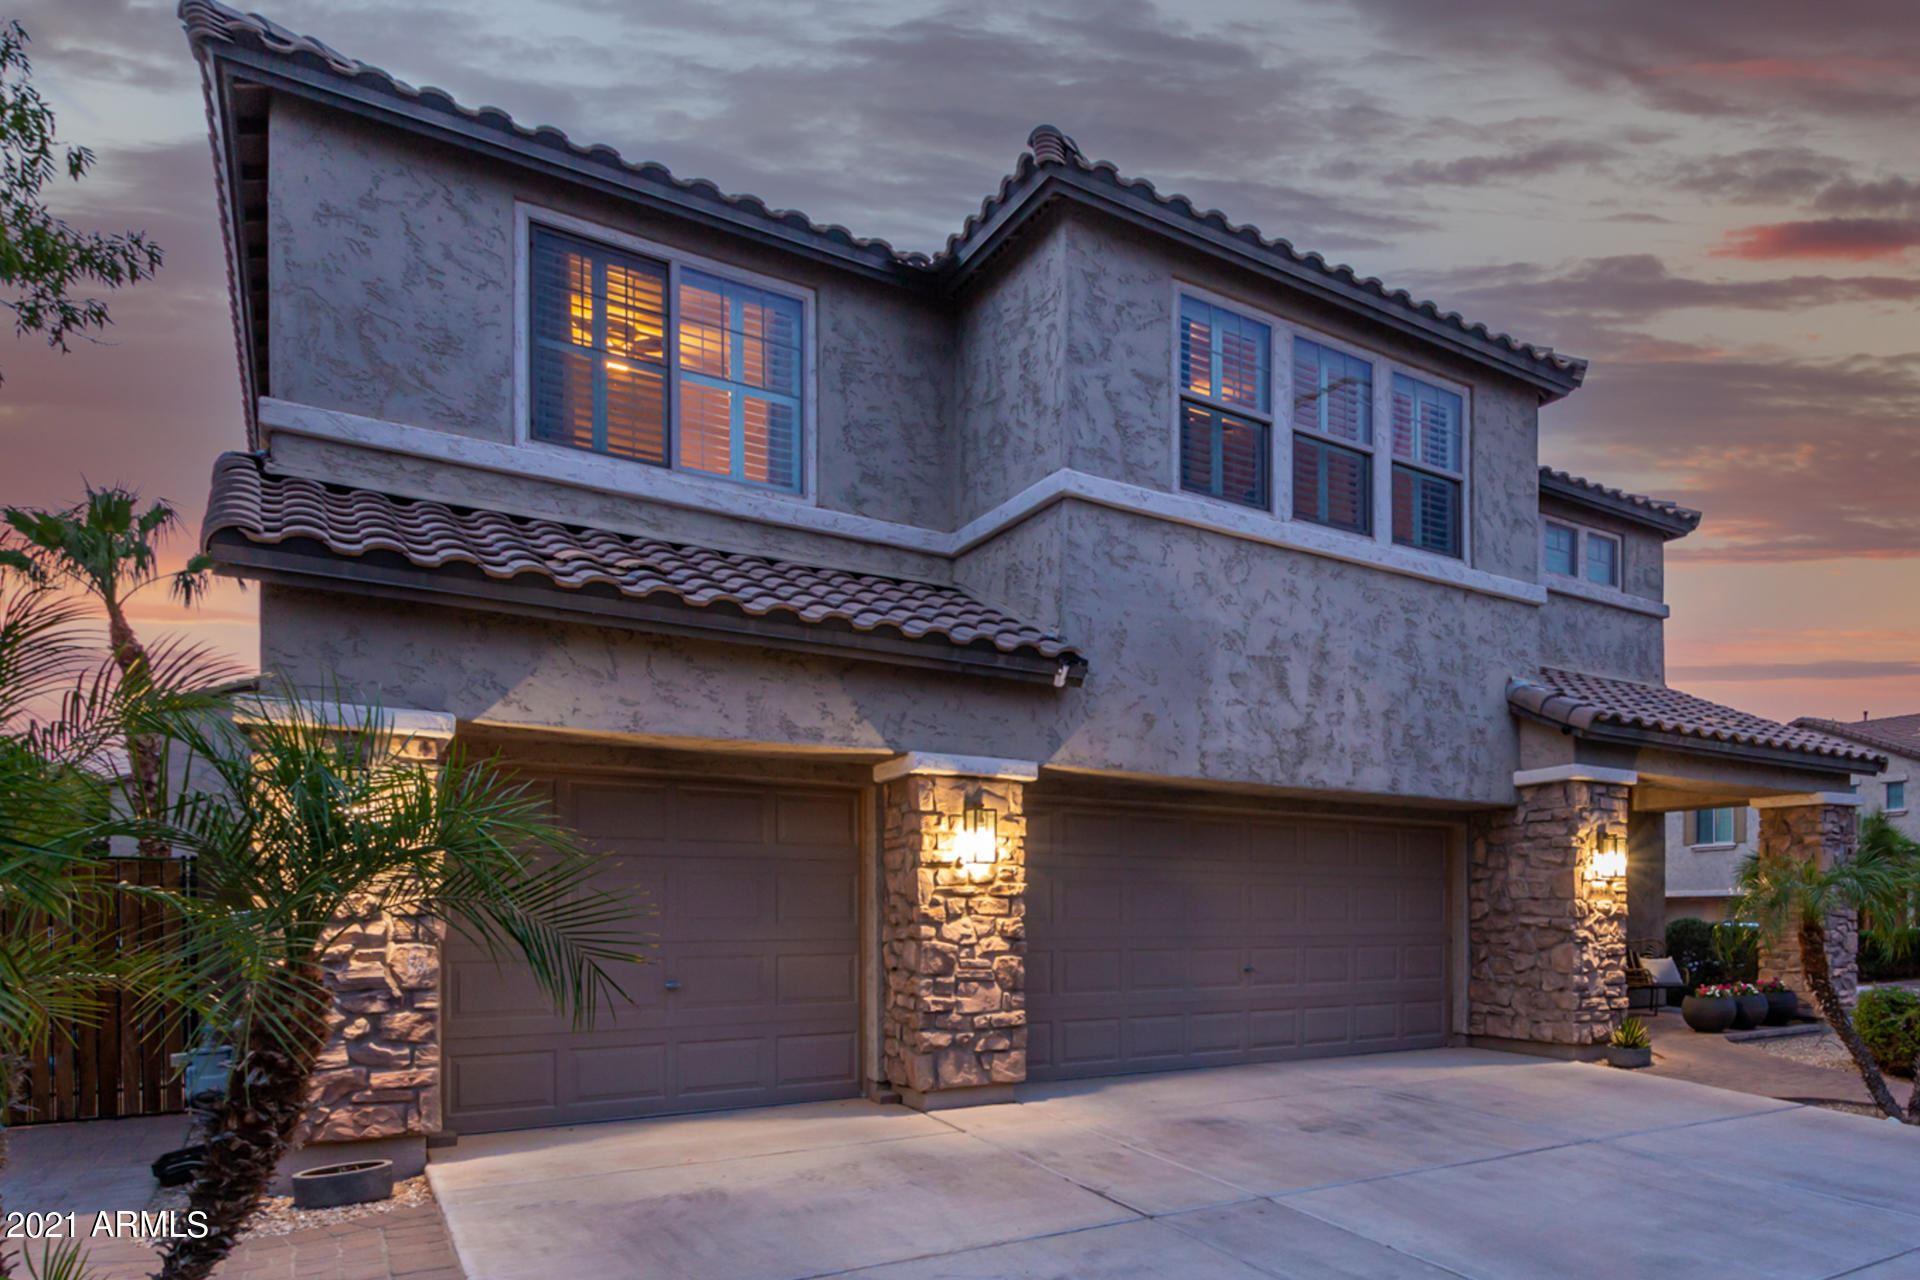 Photo of 4954 S MARRON --, Mesa, AZ 85212 (MLS # 6269242)